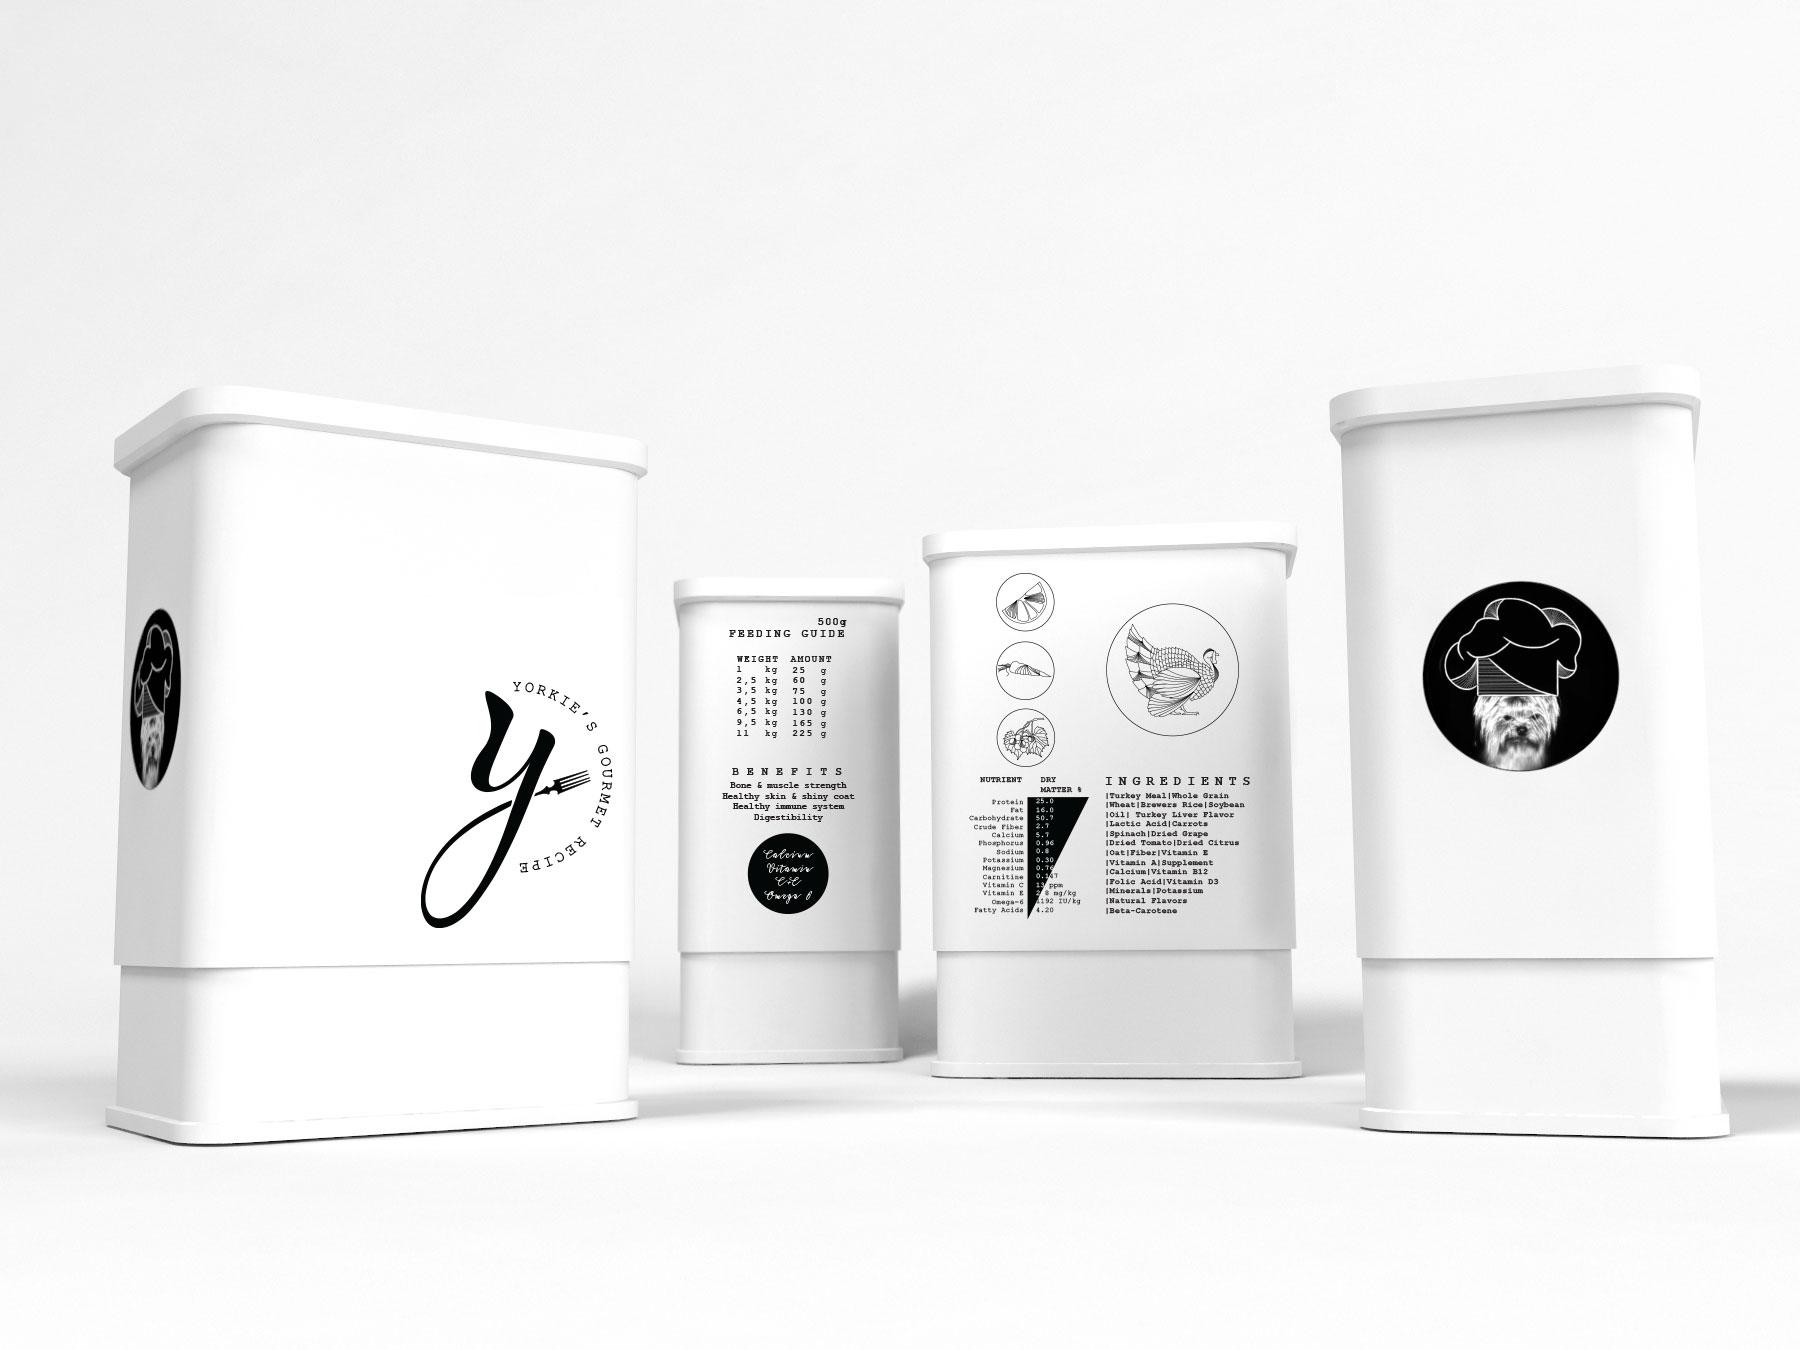 CreativeByDefinition – Yorkie's Gourmet Recipe (Concept)